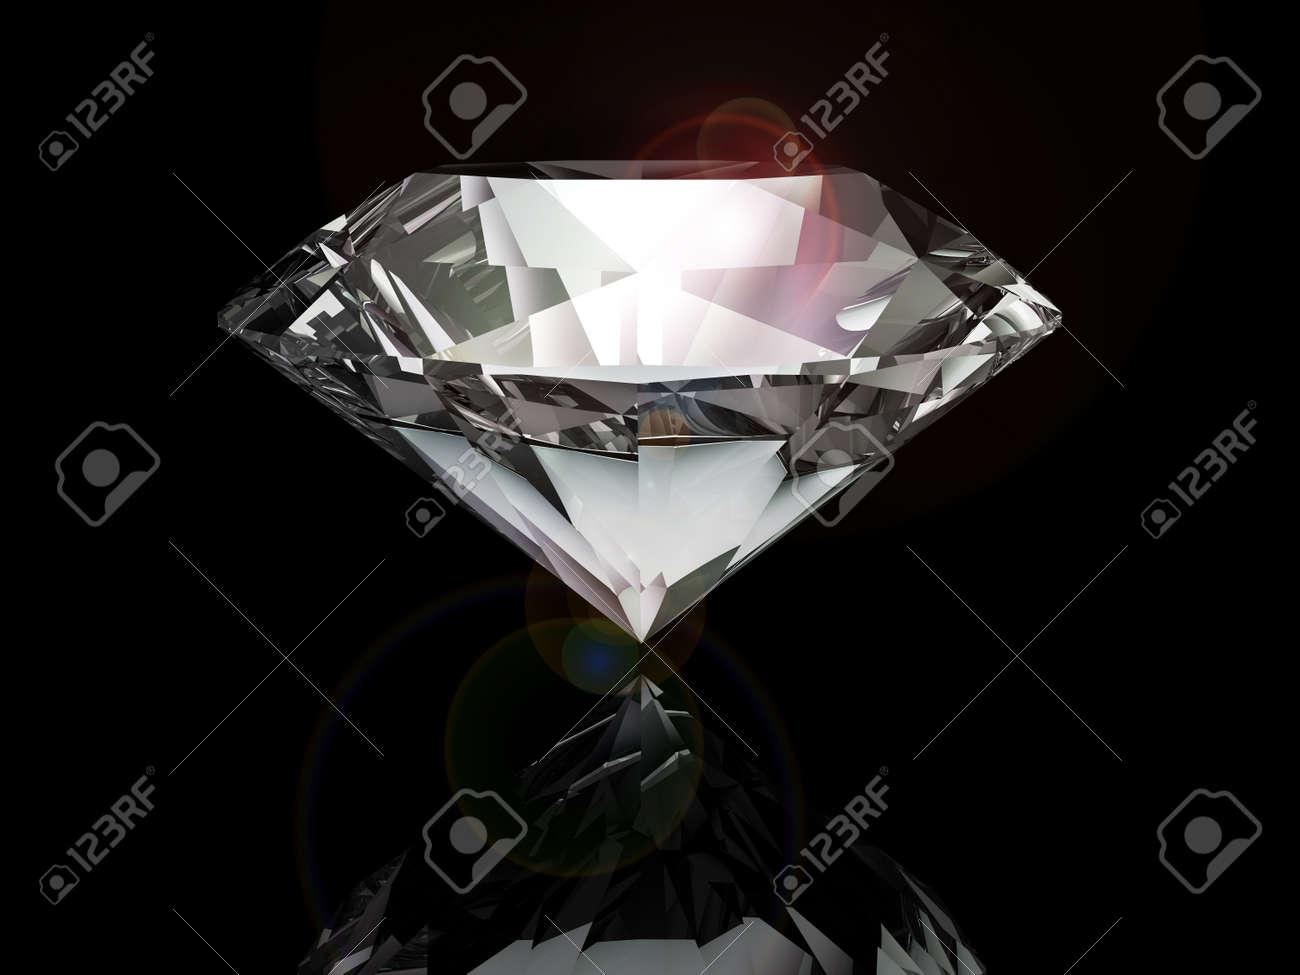 diamond on black background Stock Photo - 20010343